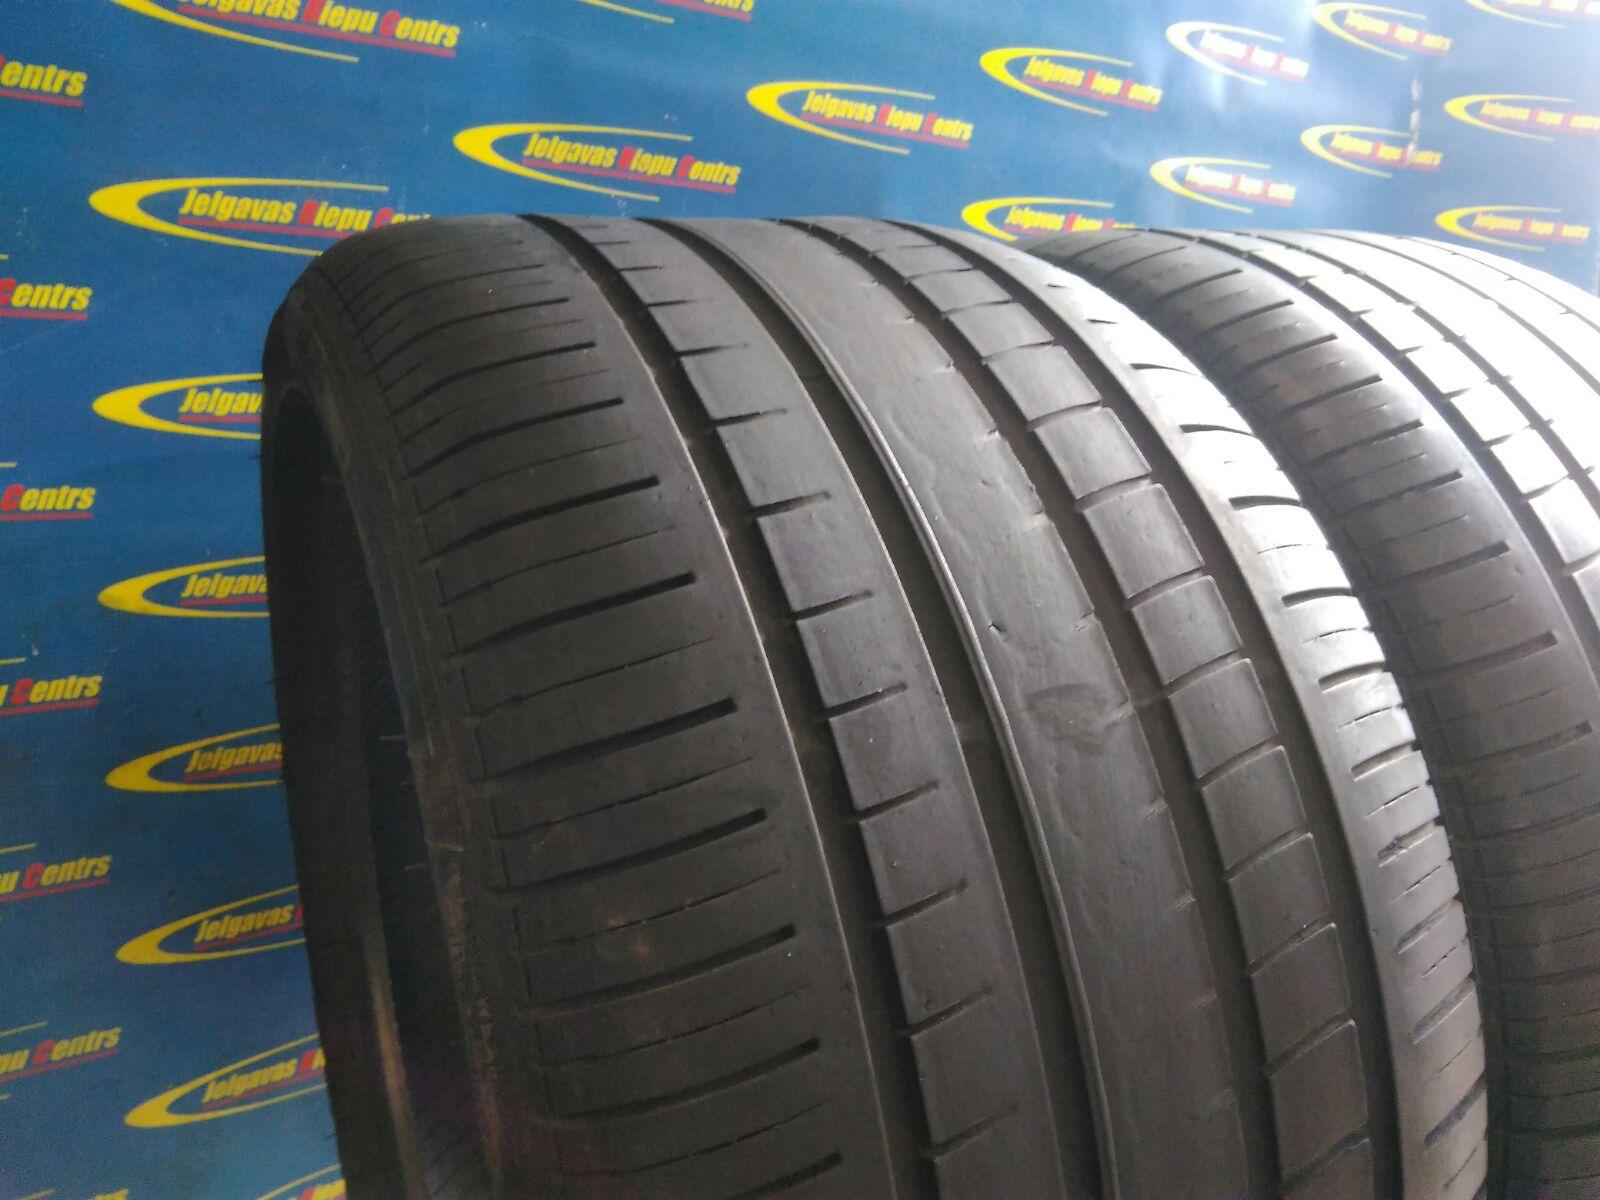 Lietota 285/30/R18 96Y Pirelli P ZeroRosso (protektora dziļums 4...3mm)